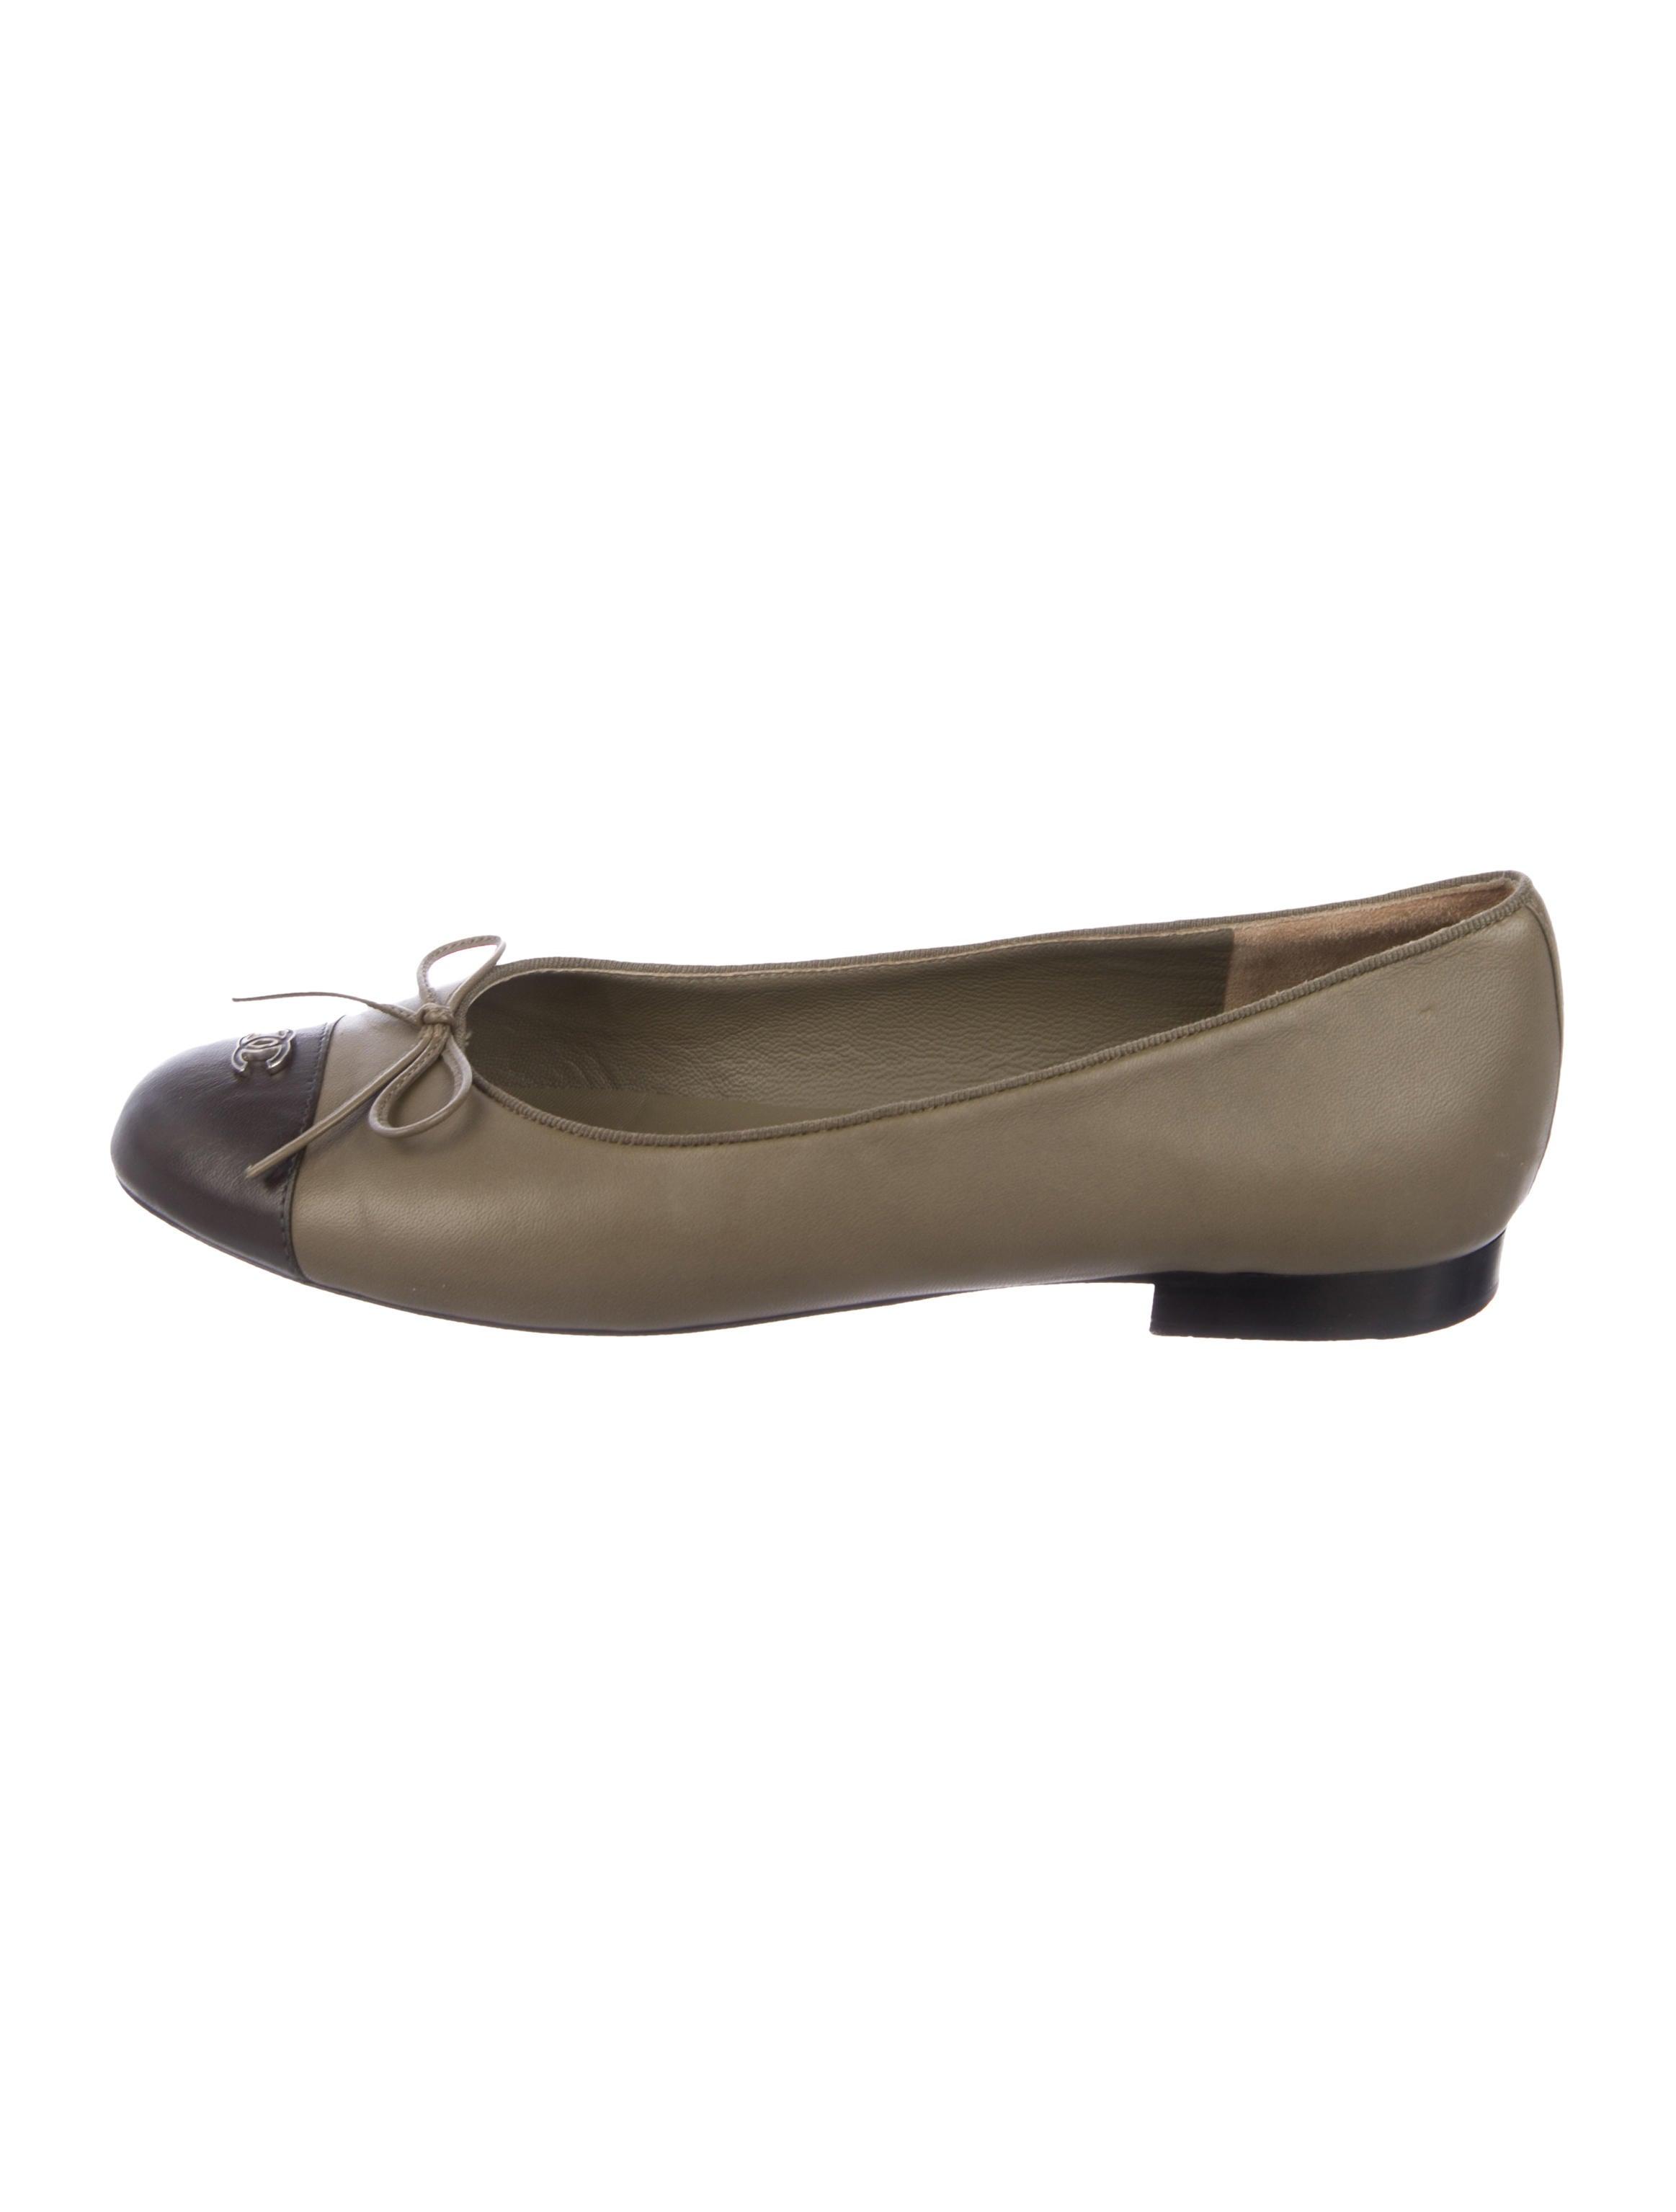 Chanel Leather CC Cap-Toe Flats - Shoes - CHA332883  642efae813456